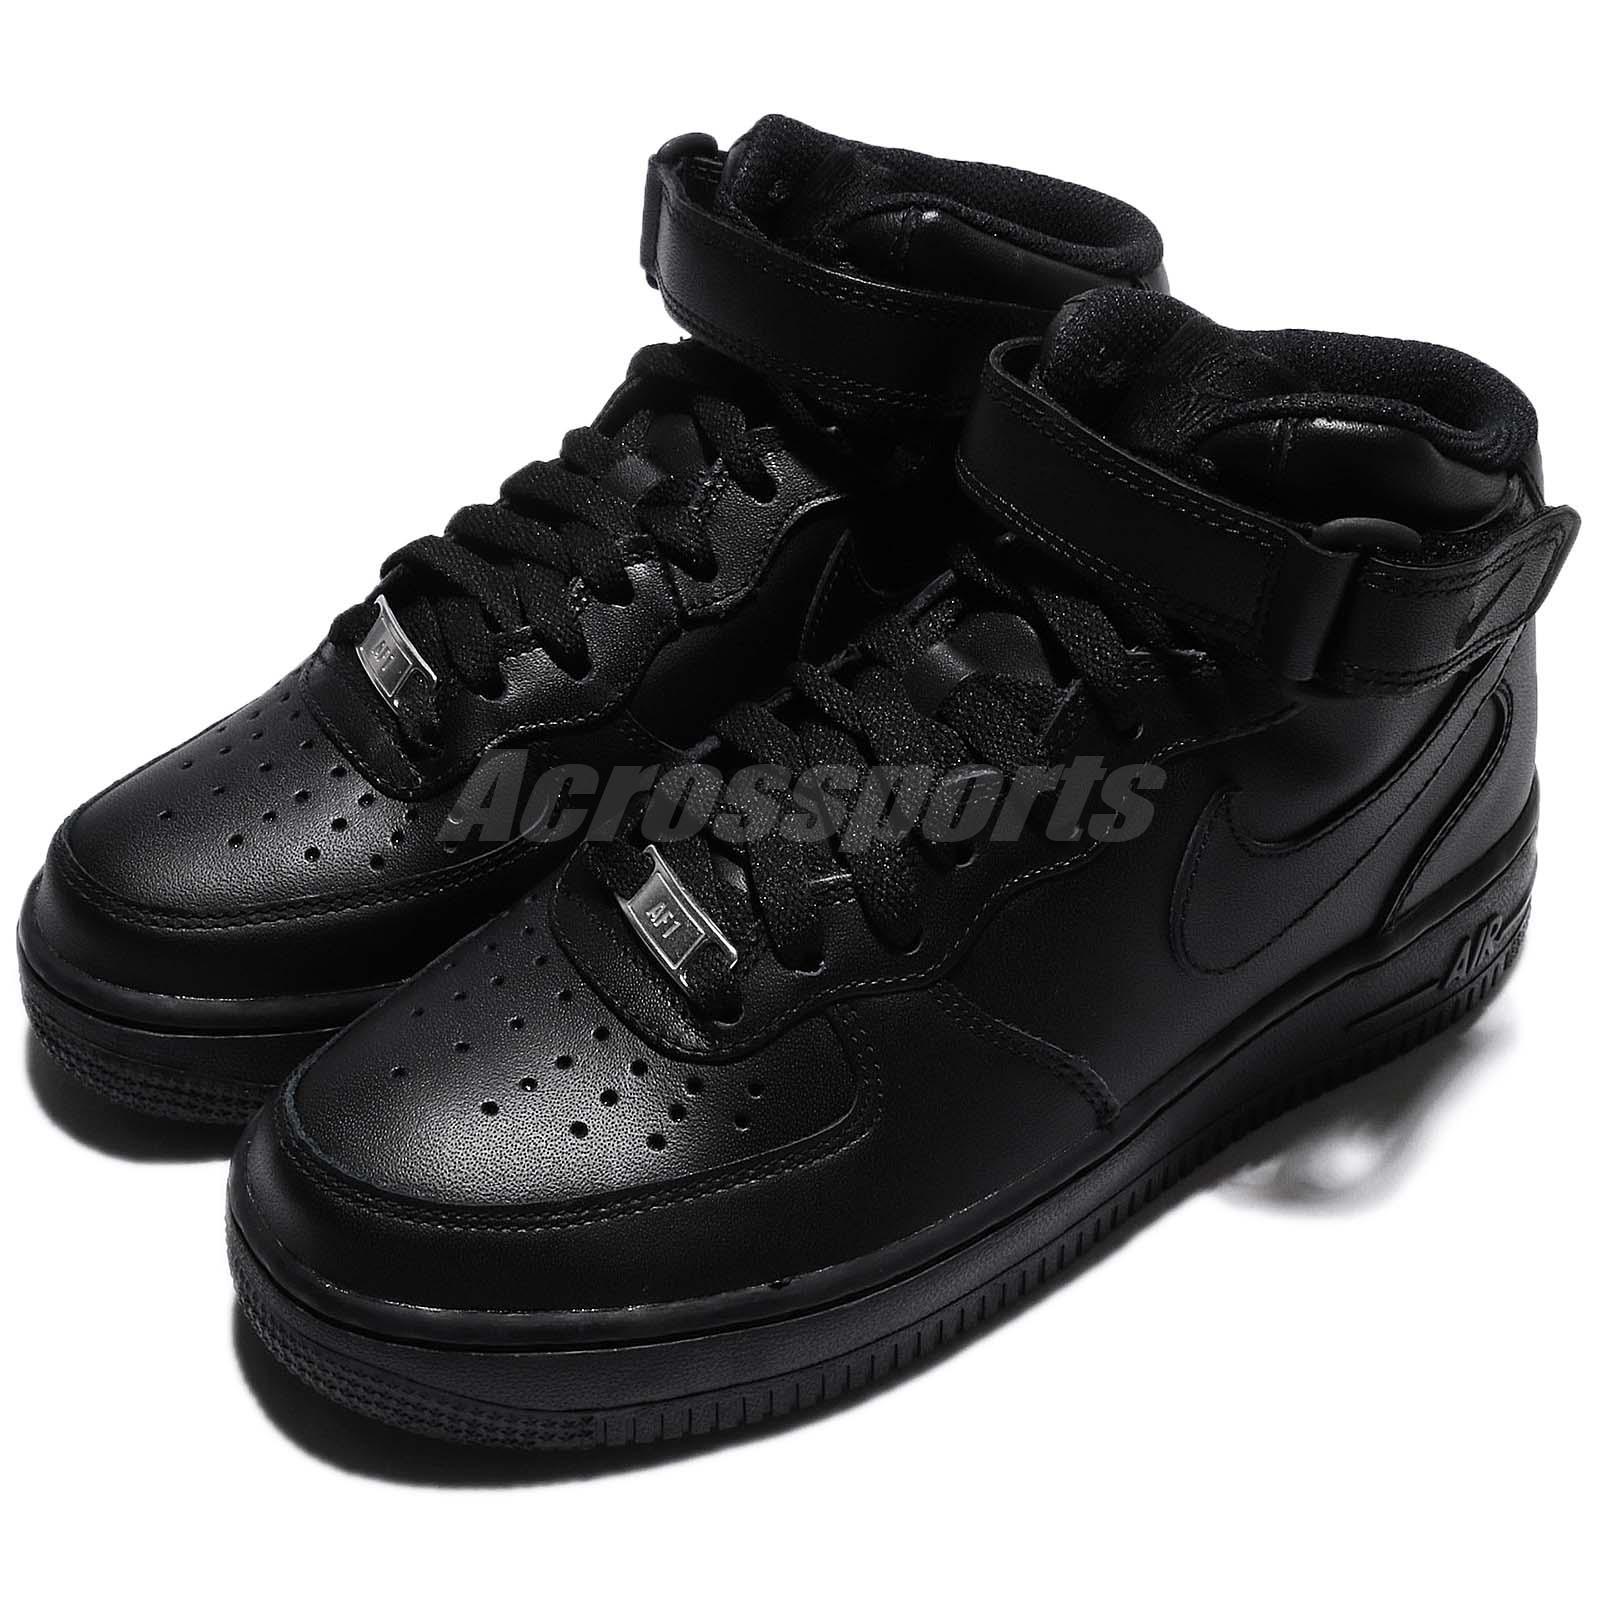 15807f9d85c Details about Wmns Nike Air Force 1 Mid 07 LE Black Out Women Shoes  Sneakers AF1 366731-001